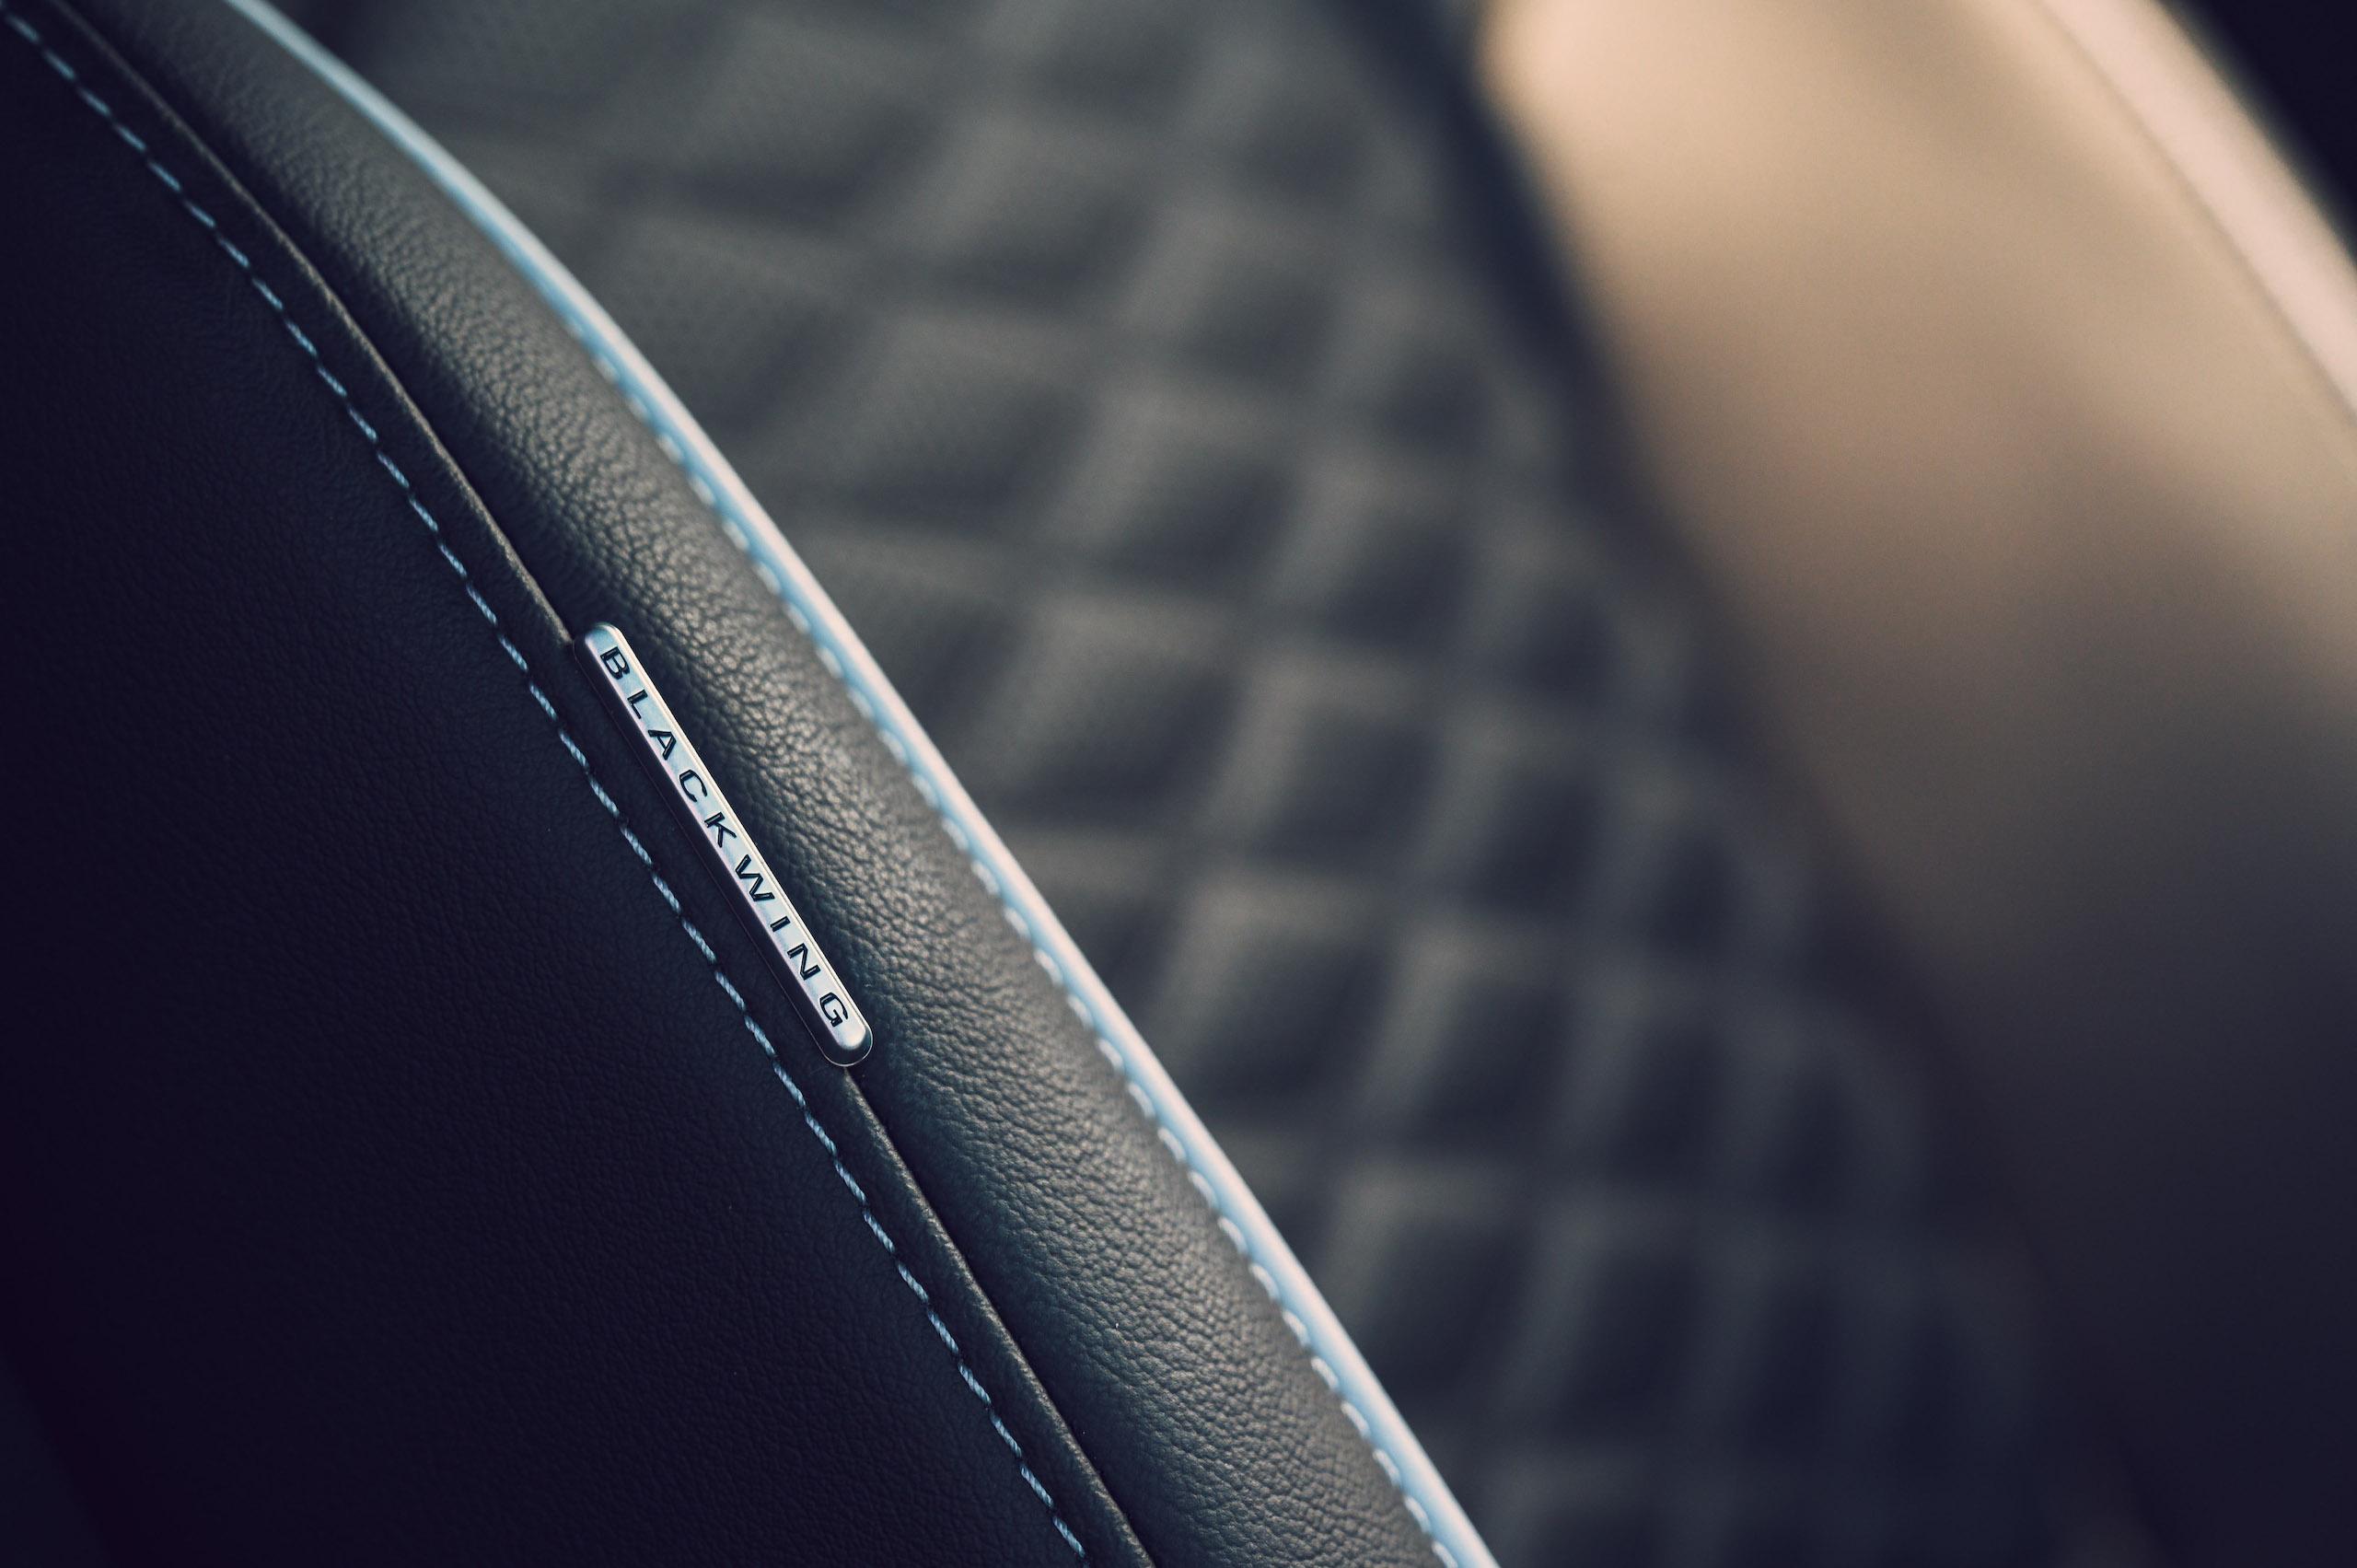 CT4-V Blackwing interior seat stitching